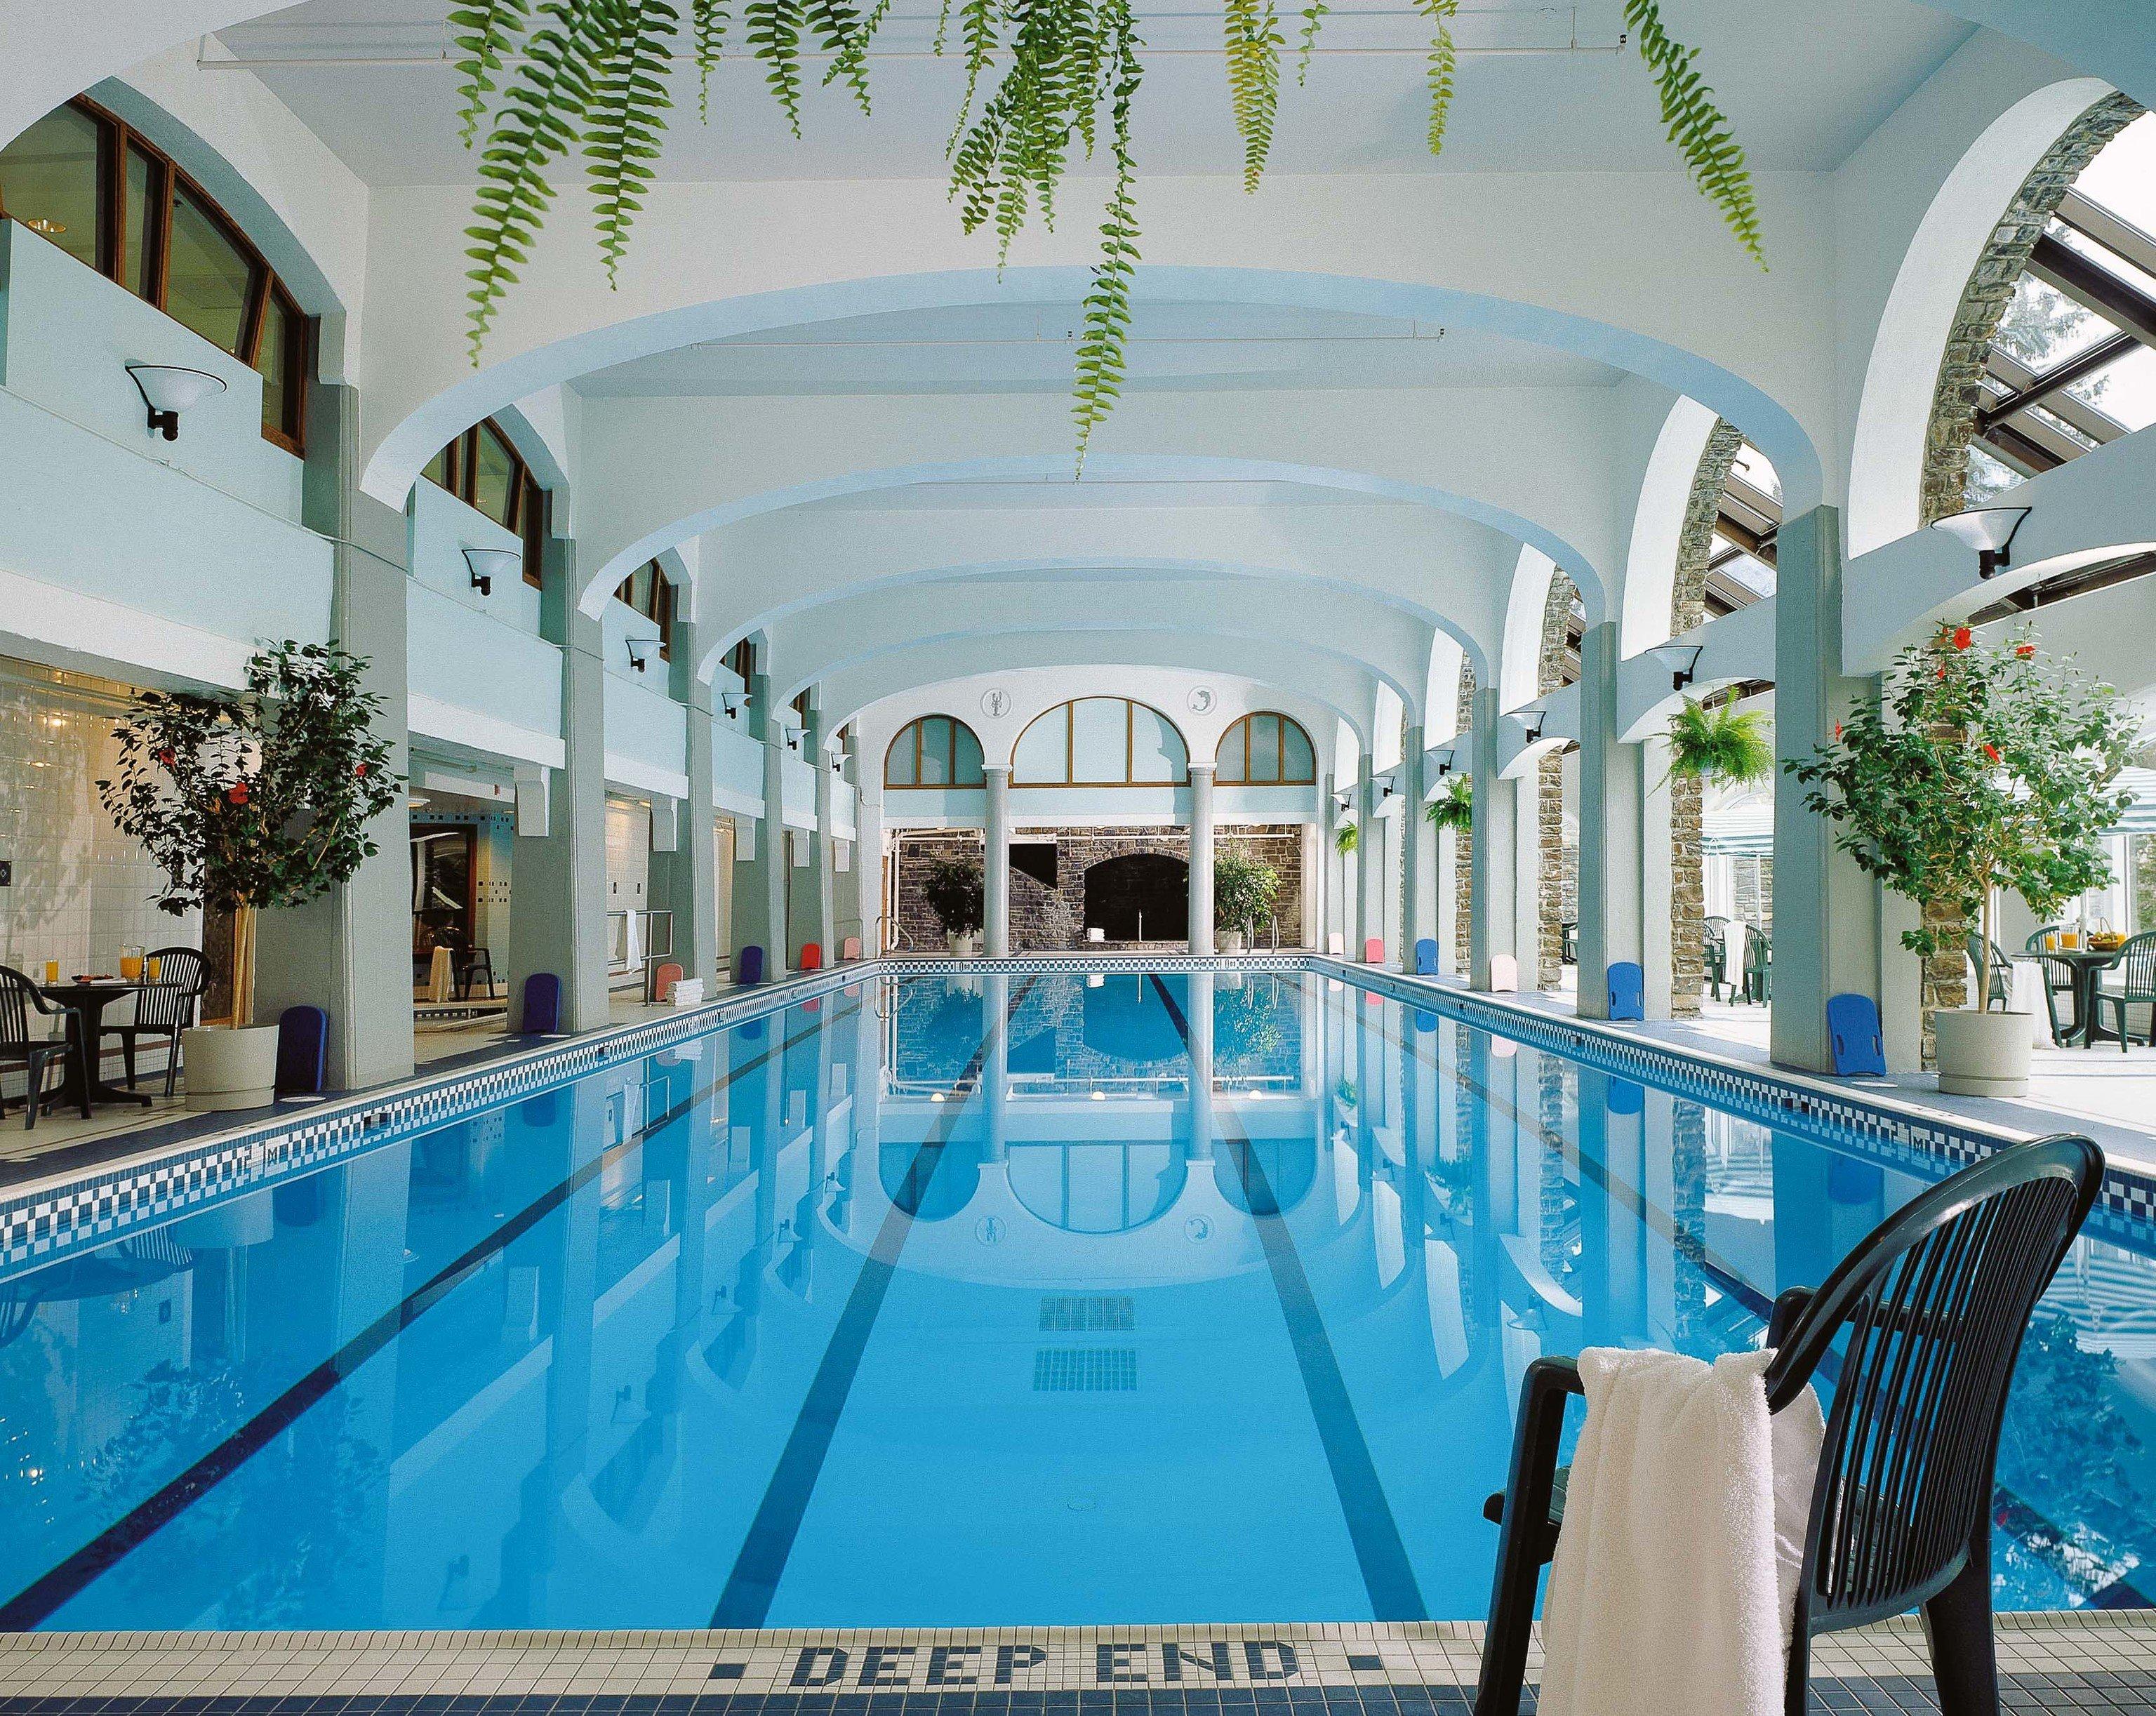 Alberta Boutique Hotels Canada Hotels swimming pool leisure leisure centre resort town Resort real estate condominium apartment vacation hotel recreation estate amenity